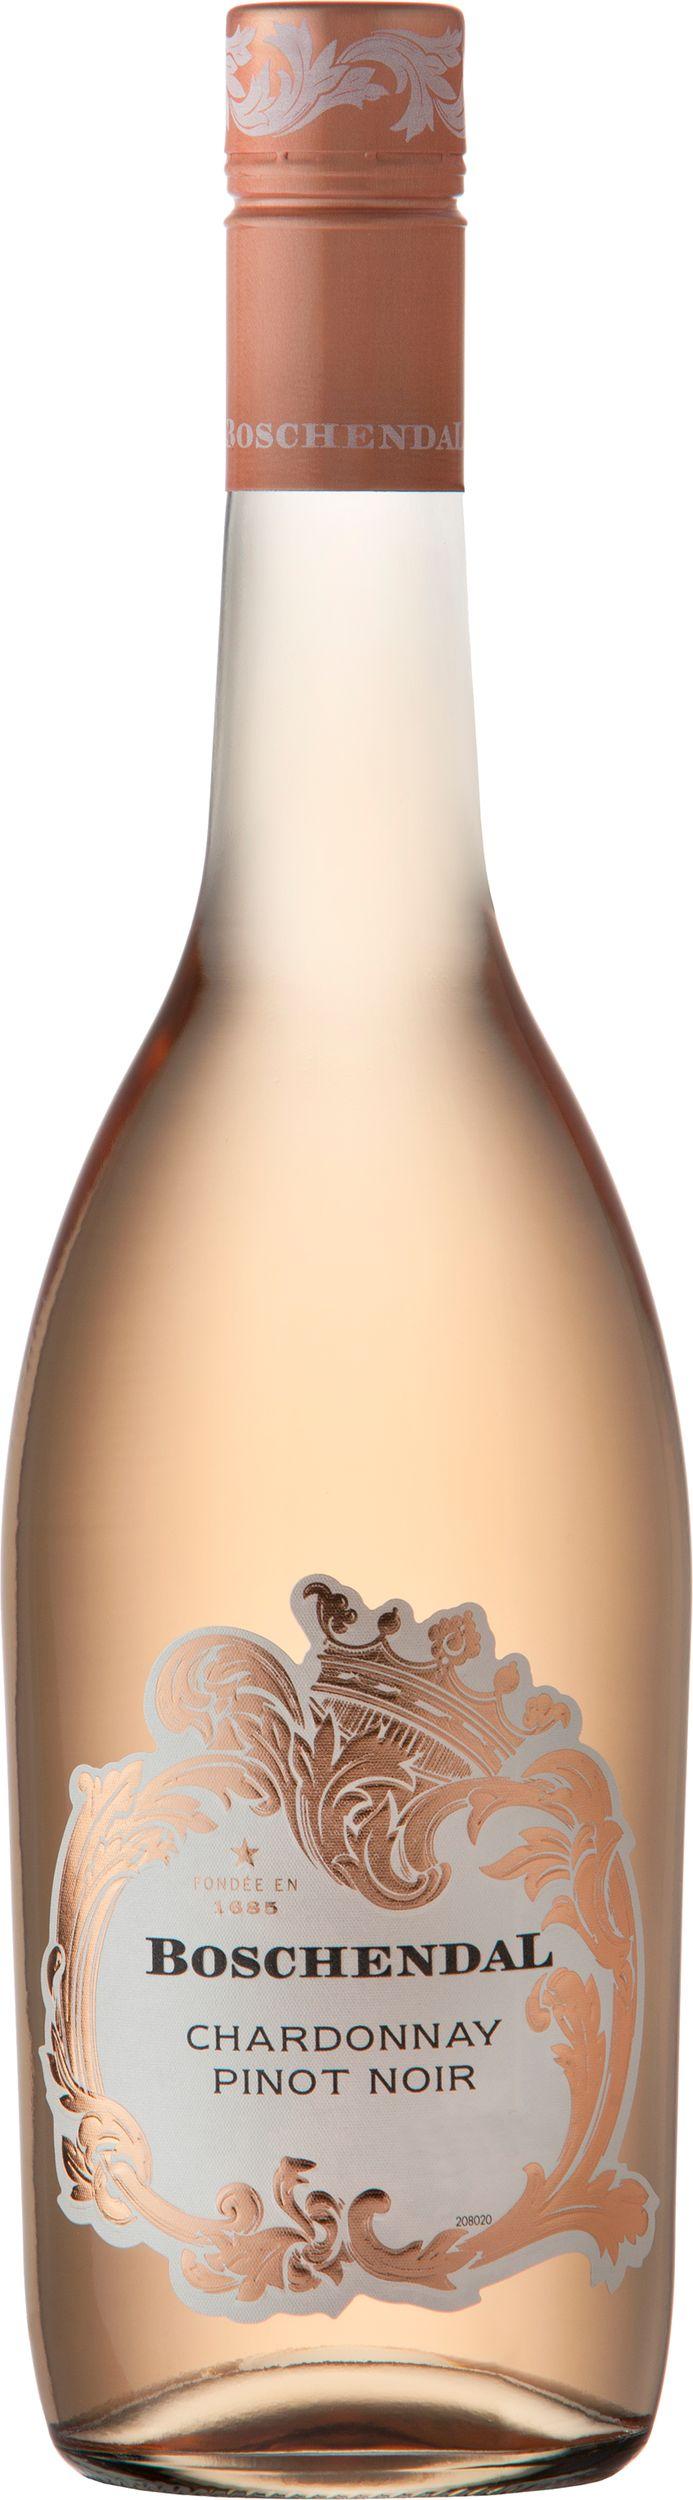 Boschendal Chardonnay Pinot Noir 2017